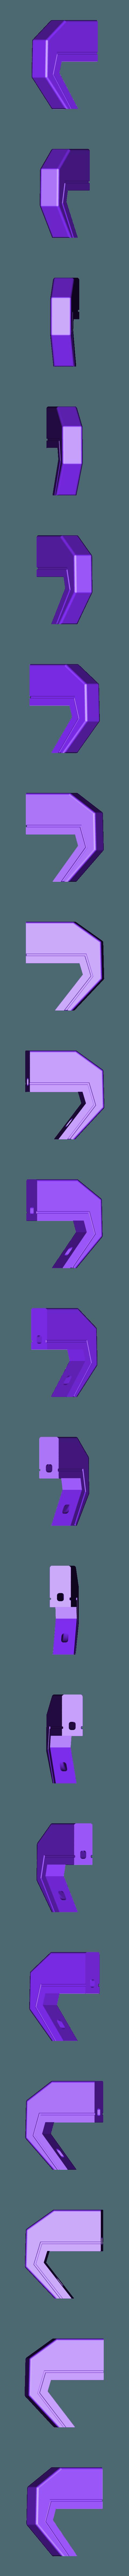 Pièce 3.STL Download STL file Translocator Sombra • 3D print model, Midnight_05